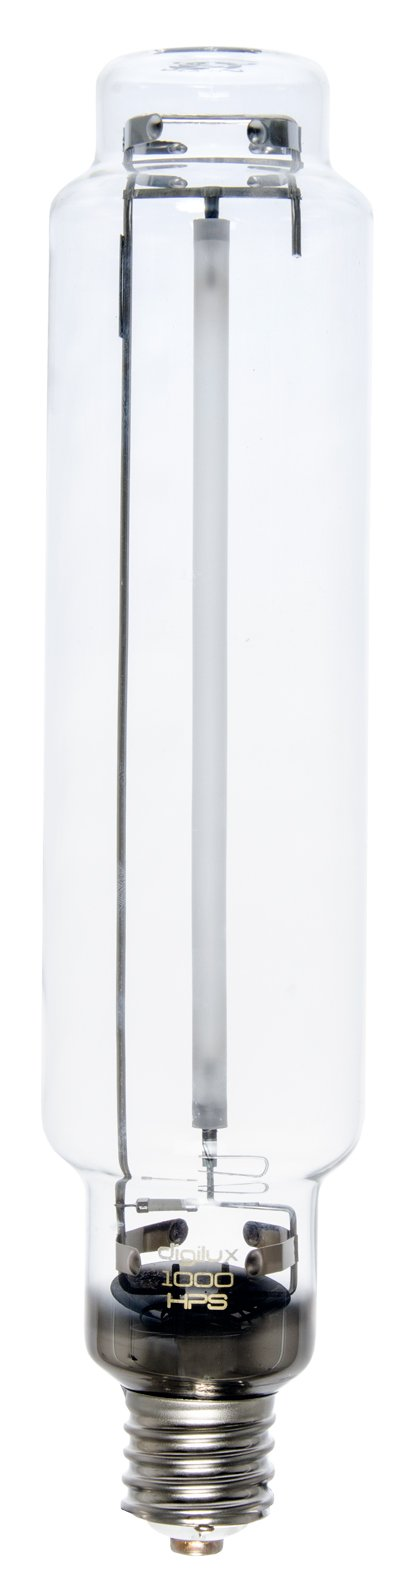 Hydrofarm DX1000HPS Digilux Digital High Pressure Sodium (HPS) Lamp, 1000W, 2000K